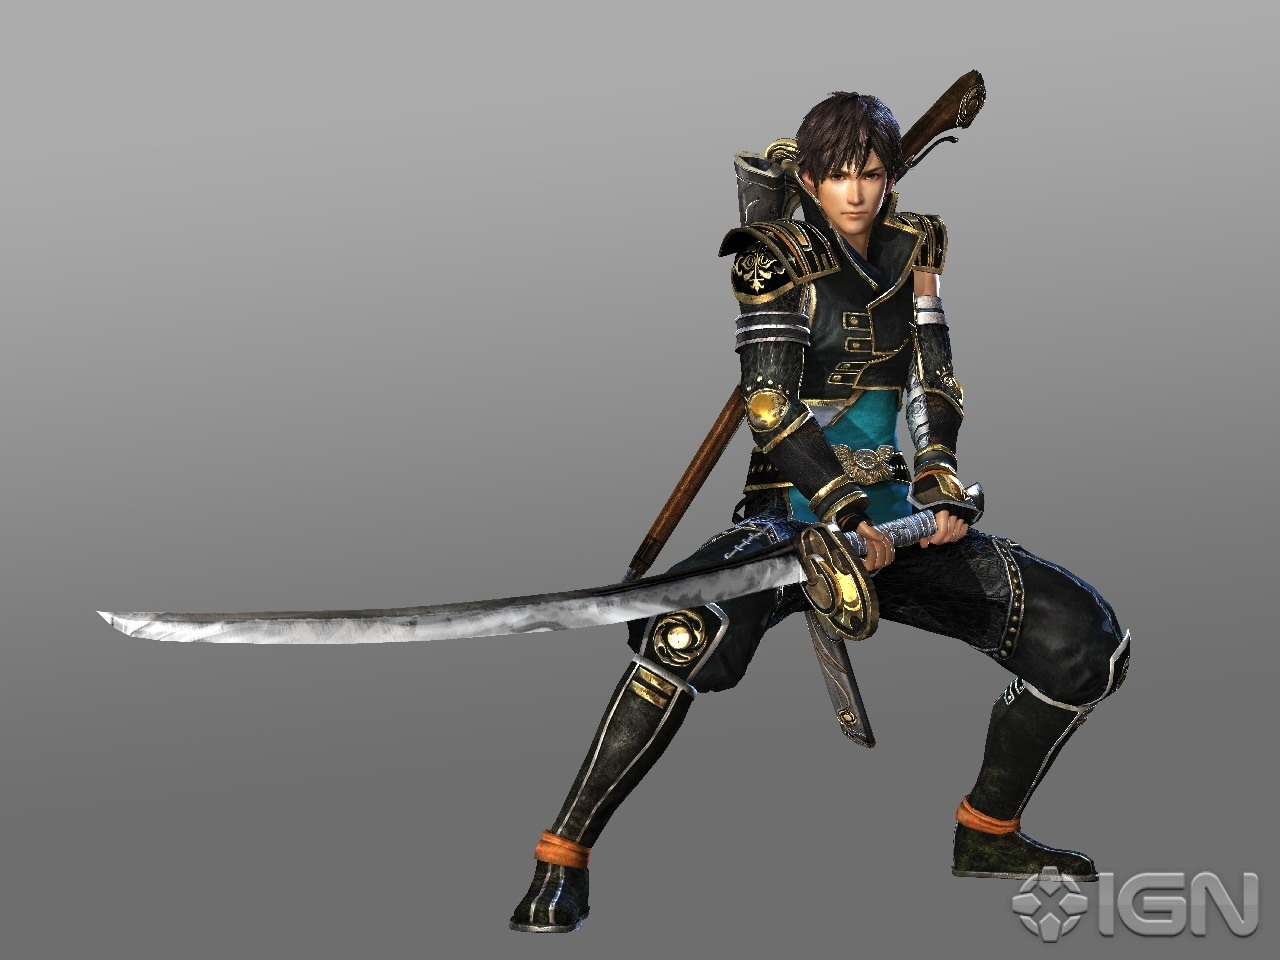 Samurai Warriors Chronicles Screenshots Pictures Wallpapers 1280x960